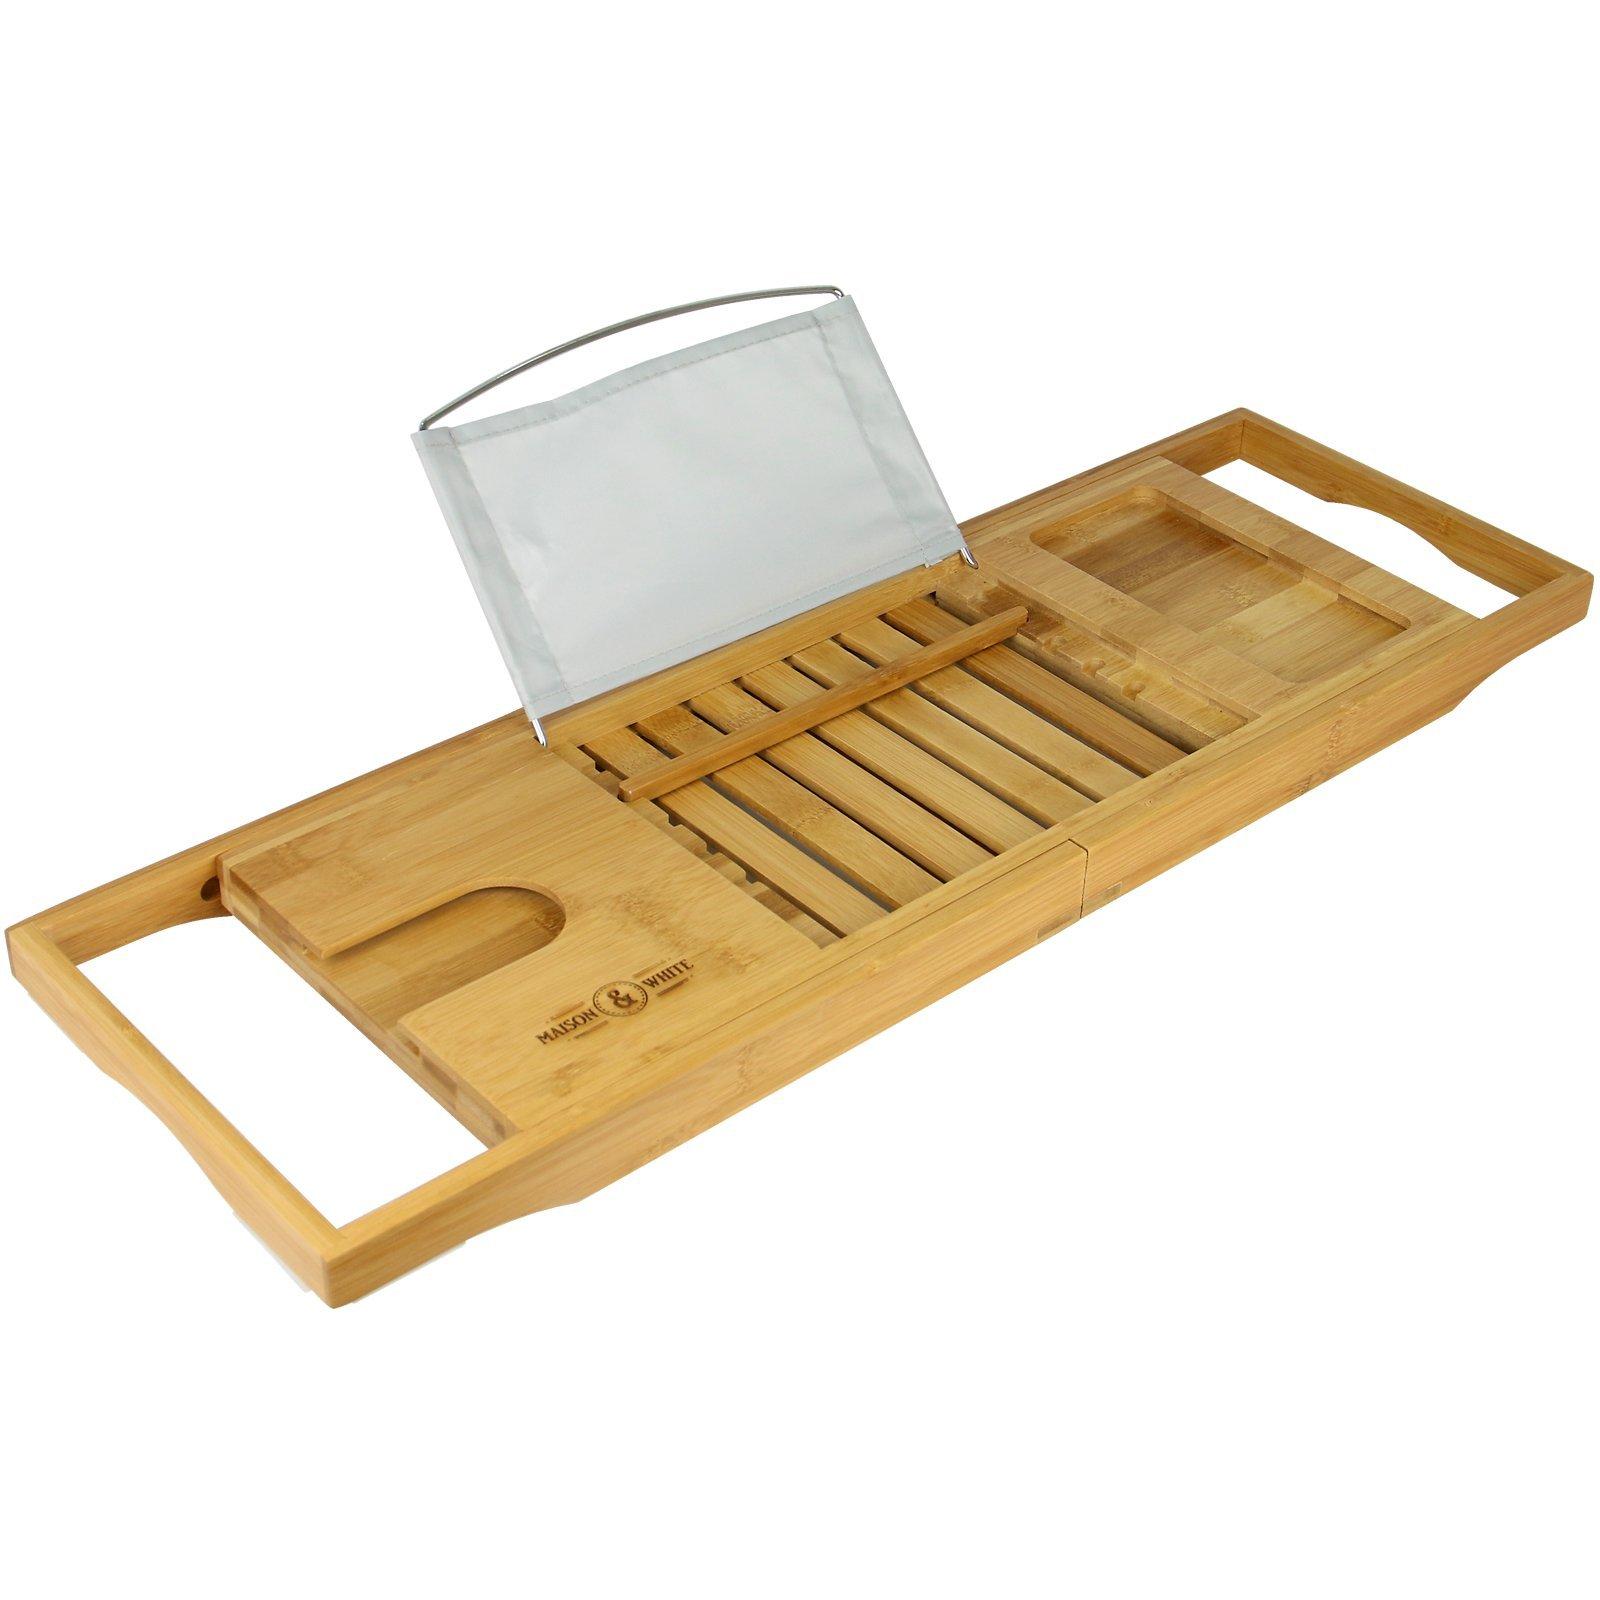 Extendable Bamboo Bath Caddy | Adjustable Home Spa Wooden Bath Tray ...